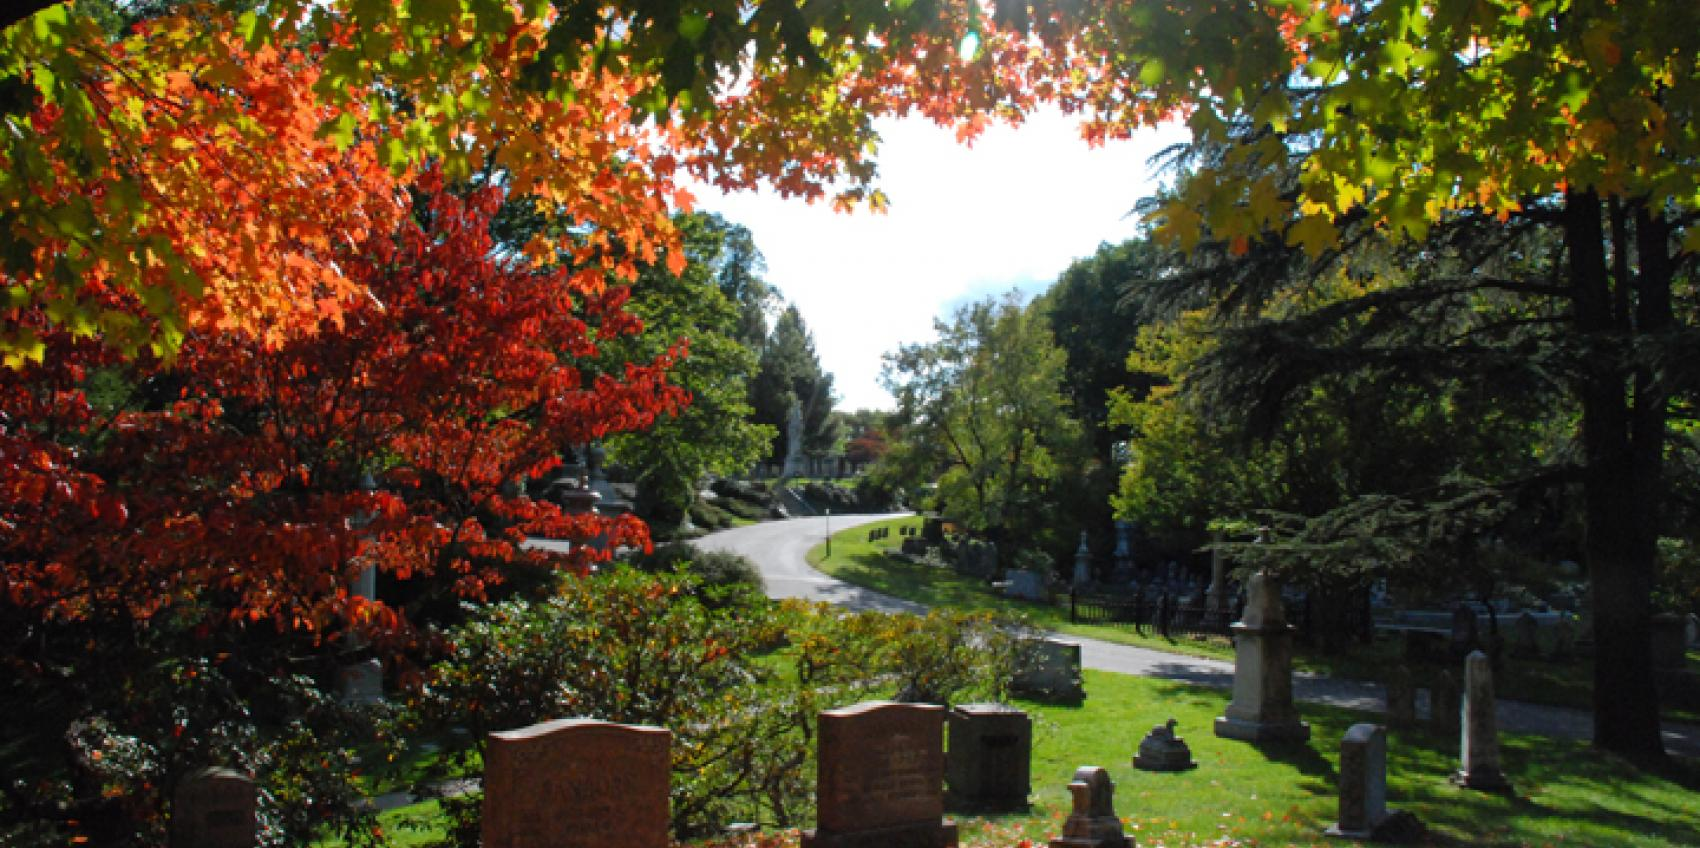 Mount Auburn Cemetery American Public Gardens Association